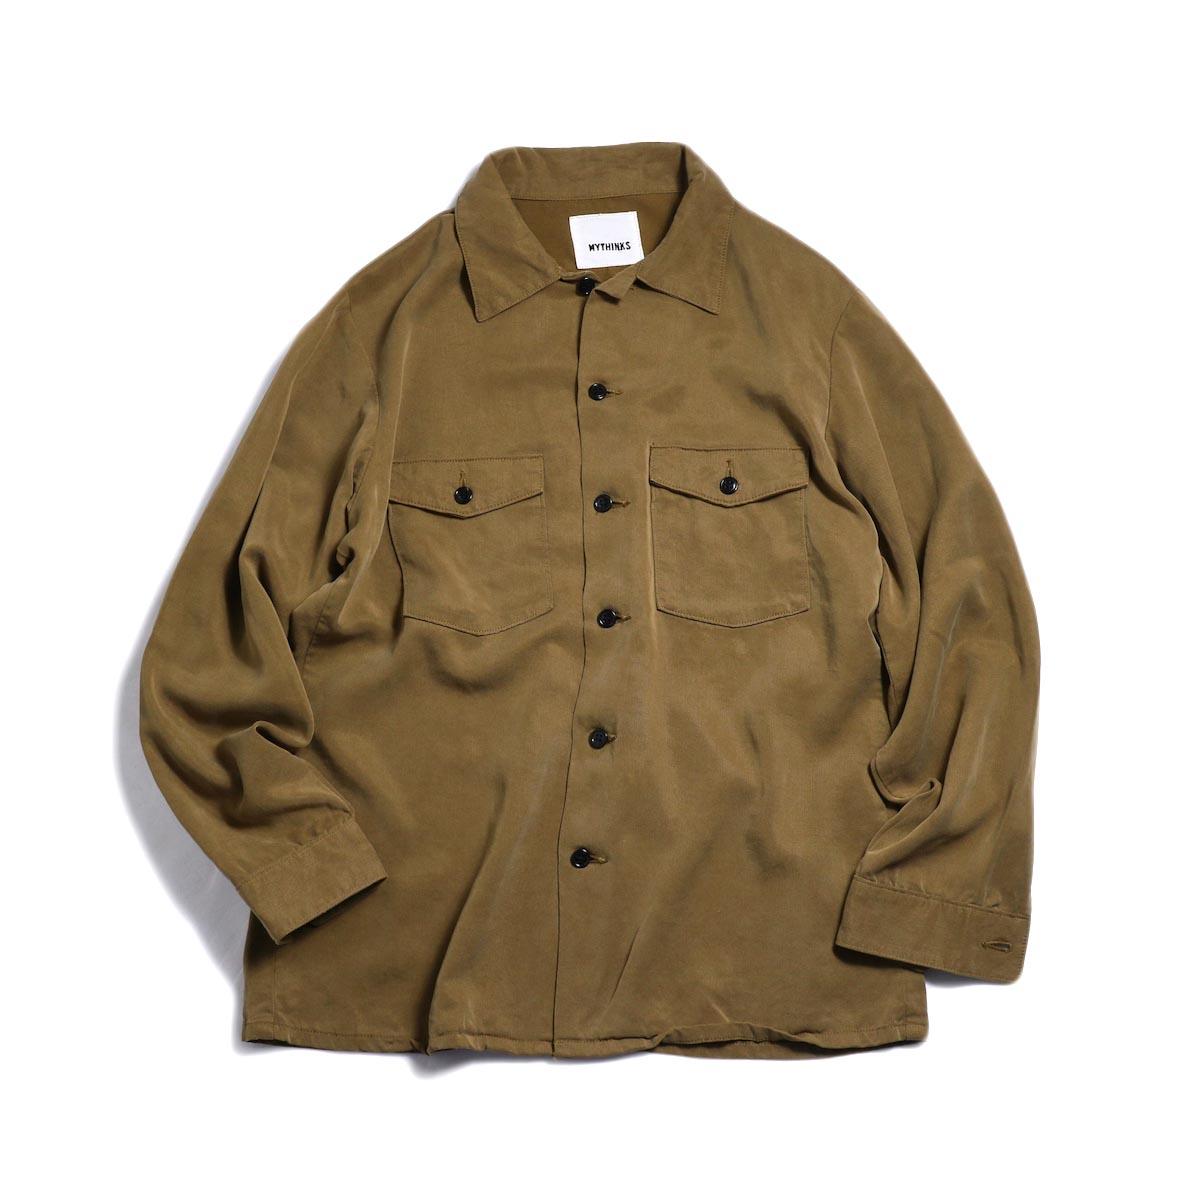 MYTHINKS (Men's) / MY Tencel Army Shirt -Brown